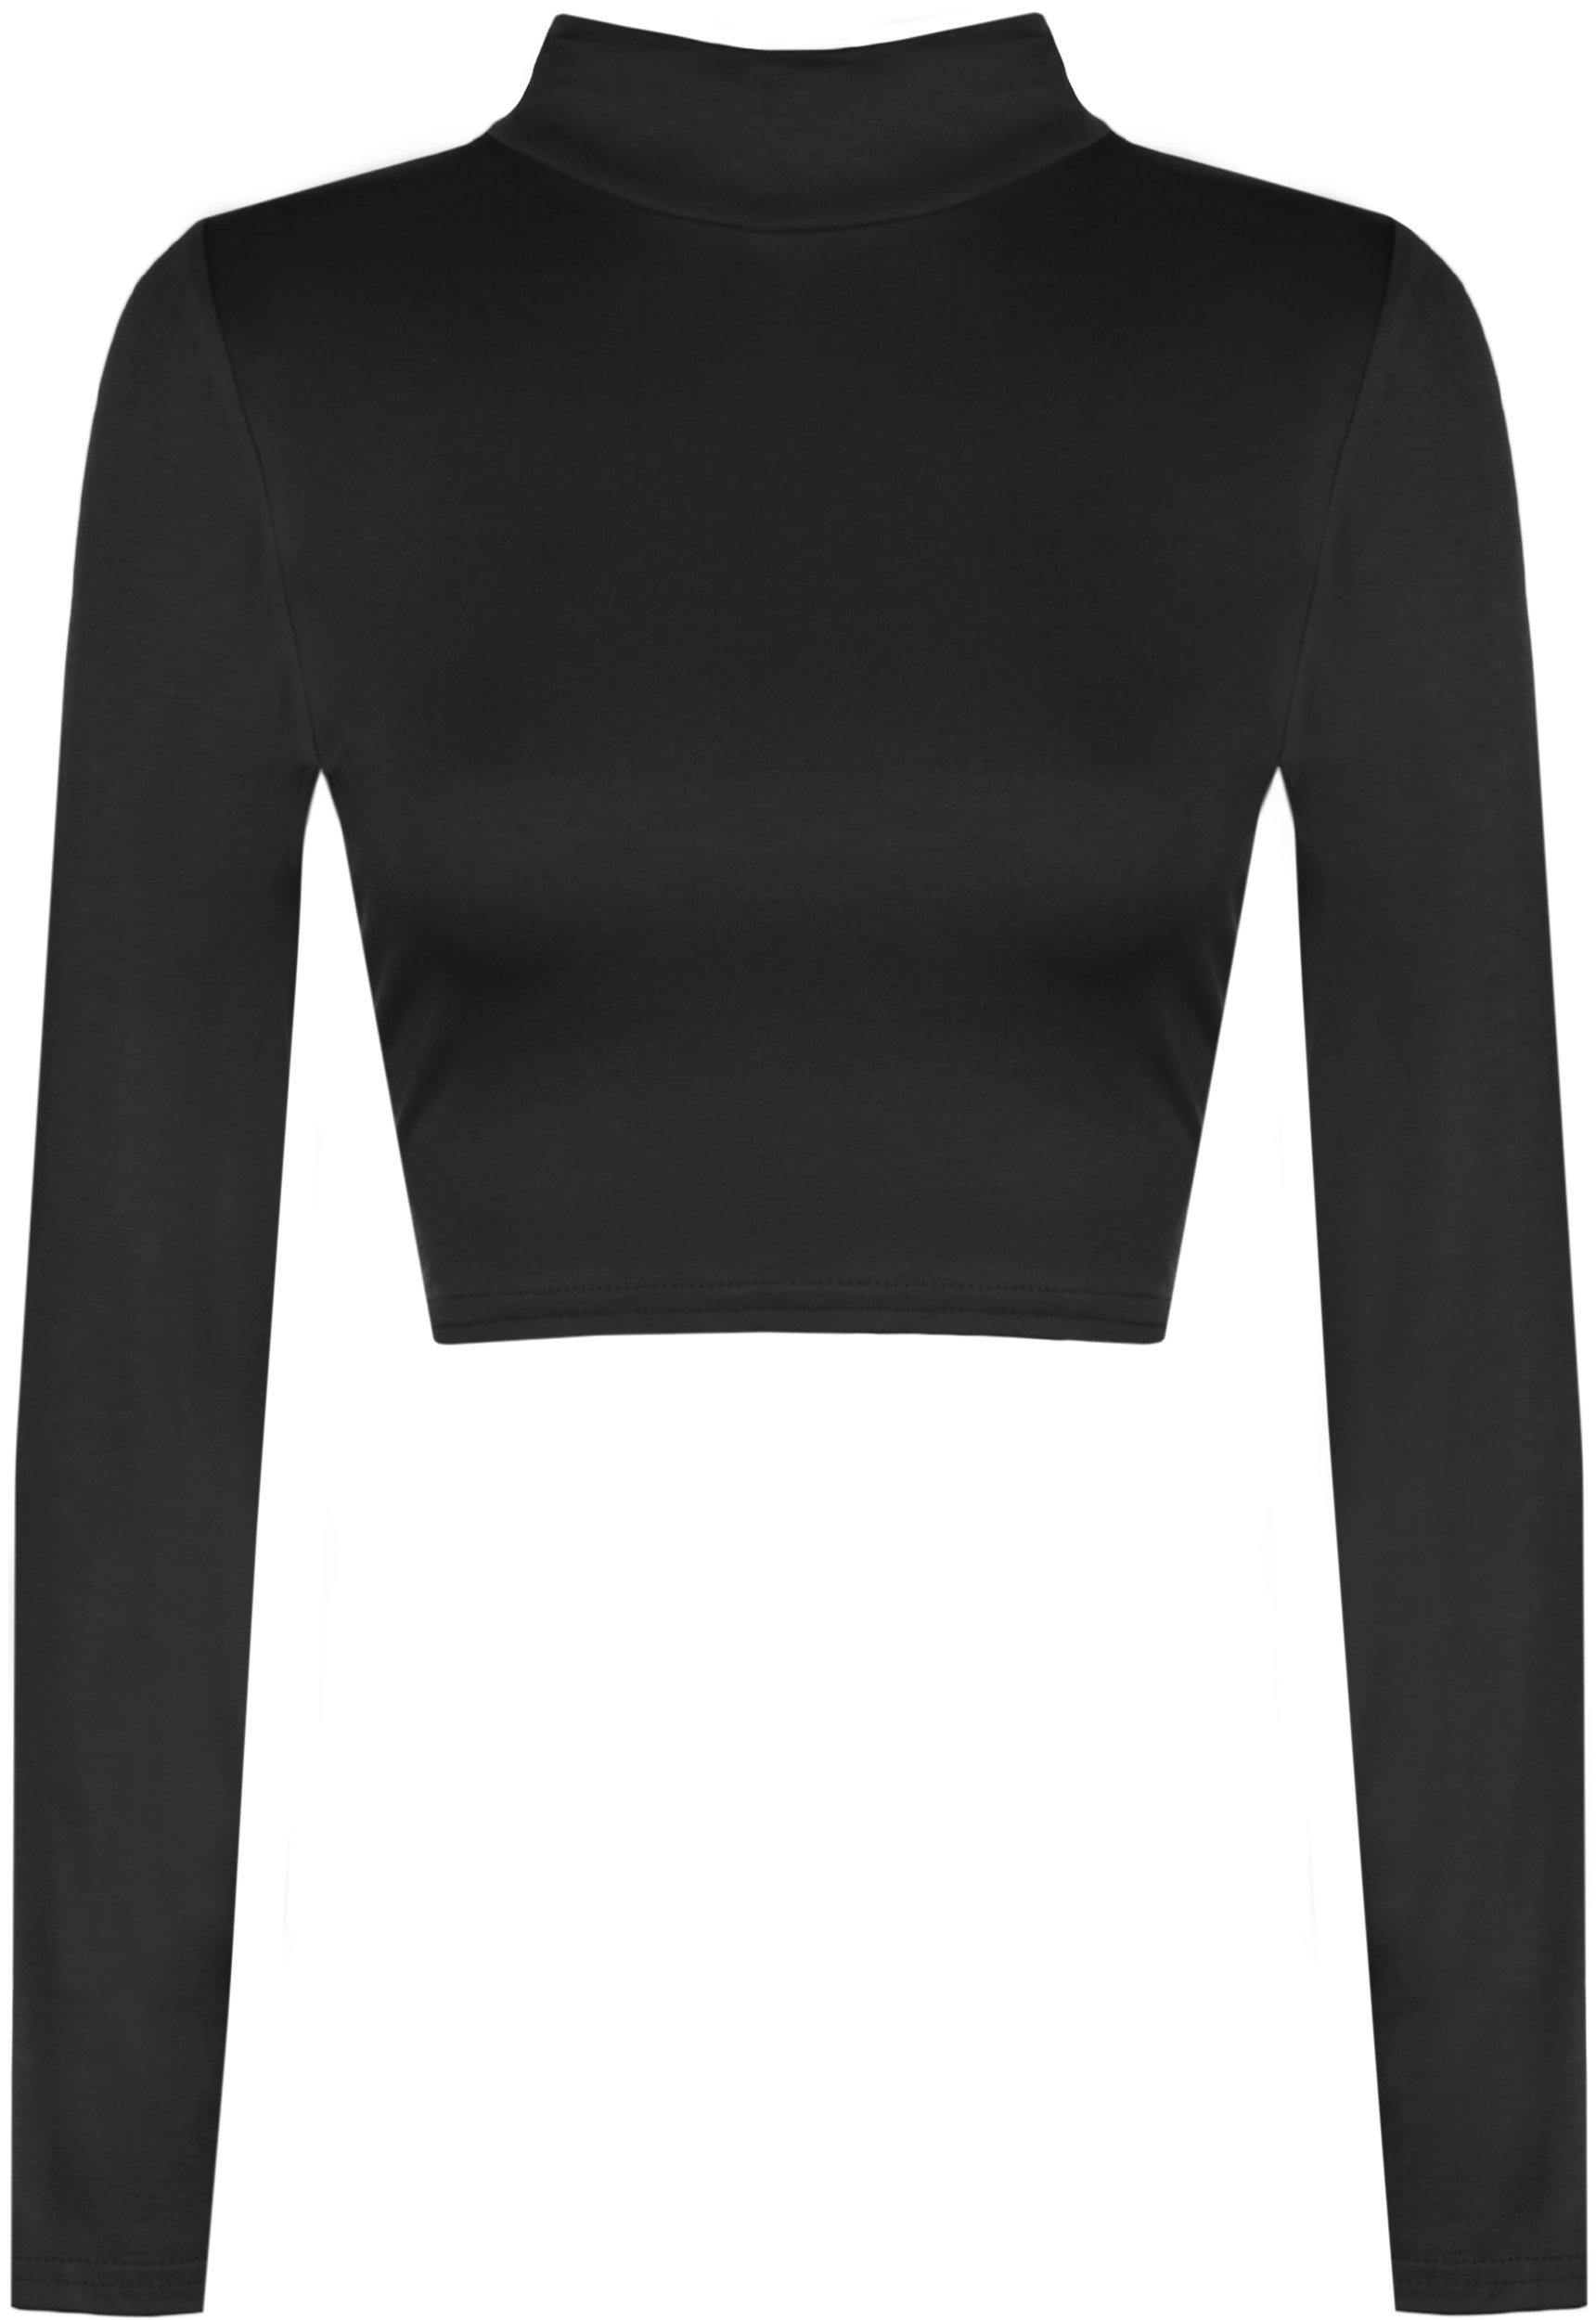 WearAll Womens Turtle Neck Crop Long Sleeve Plain Top - Black - US 4-6 (UK 8-10)